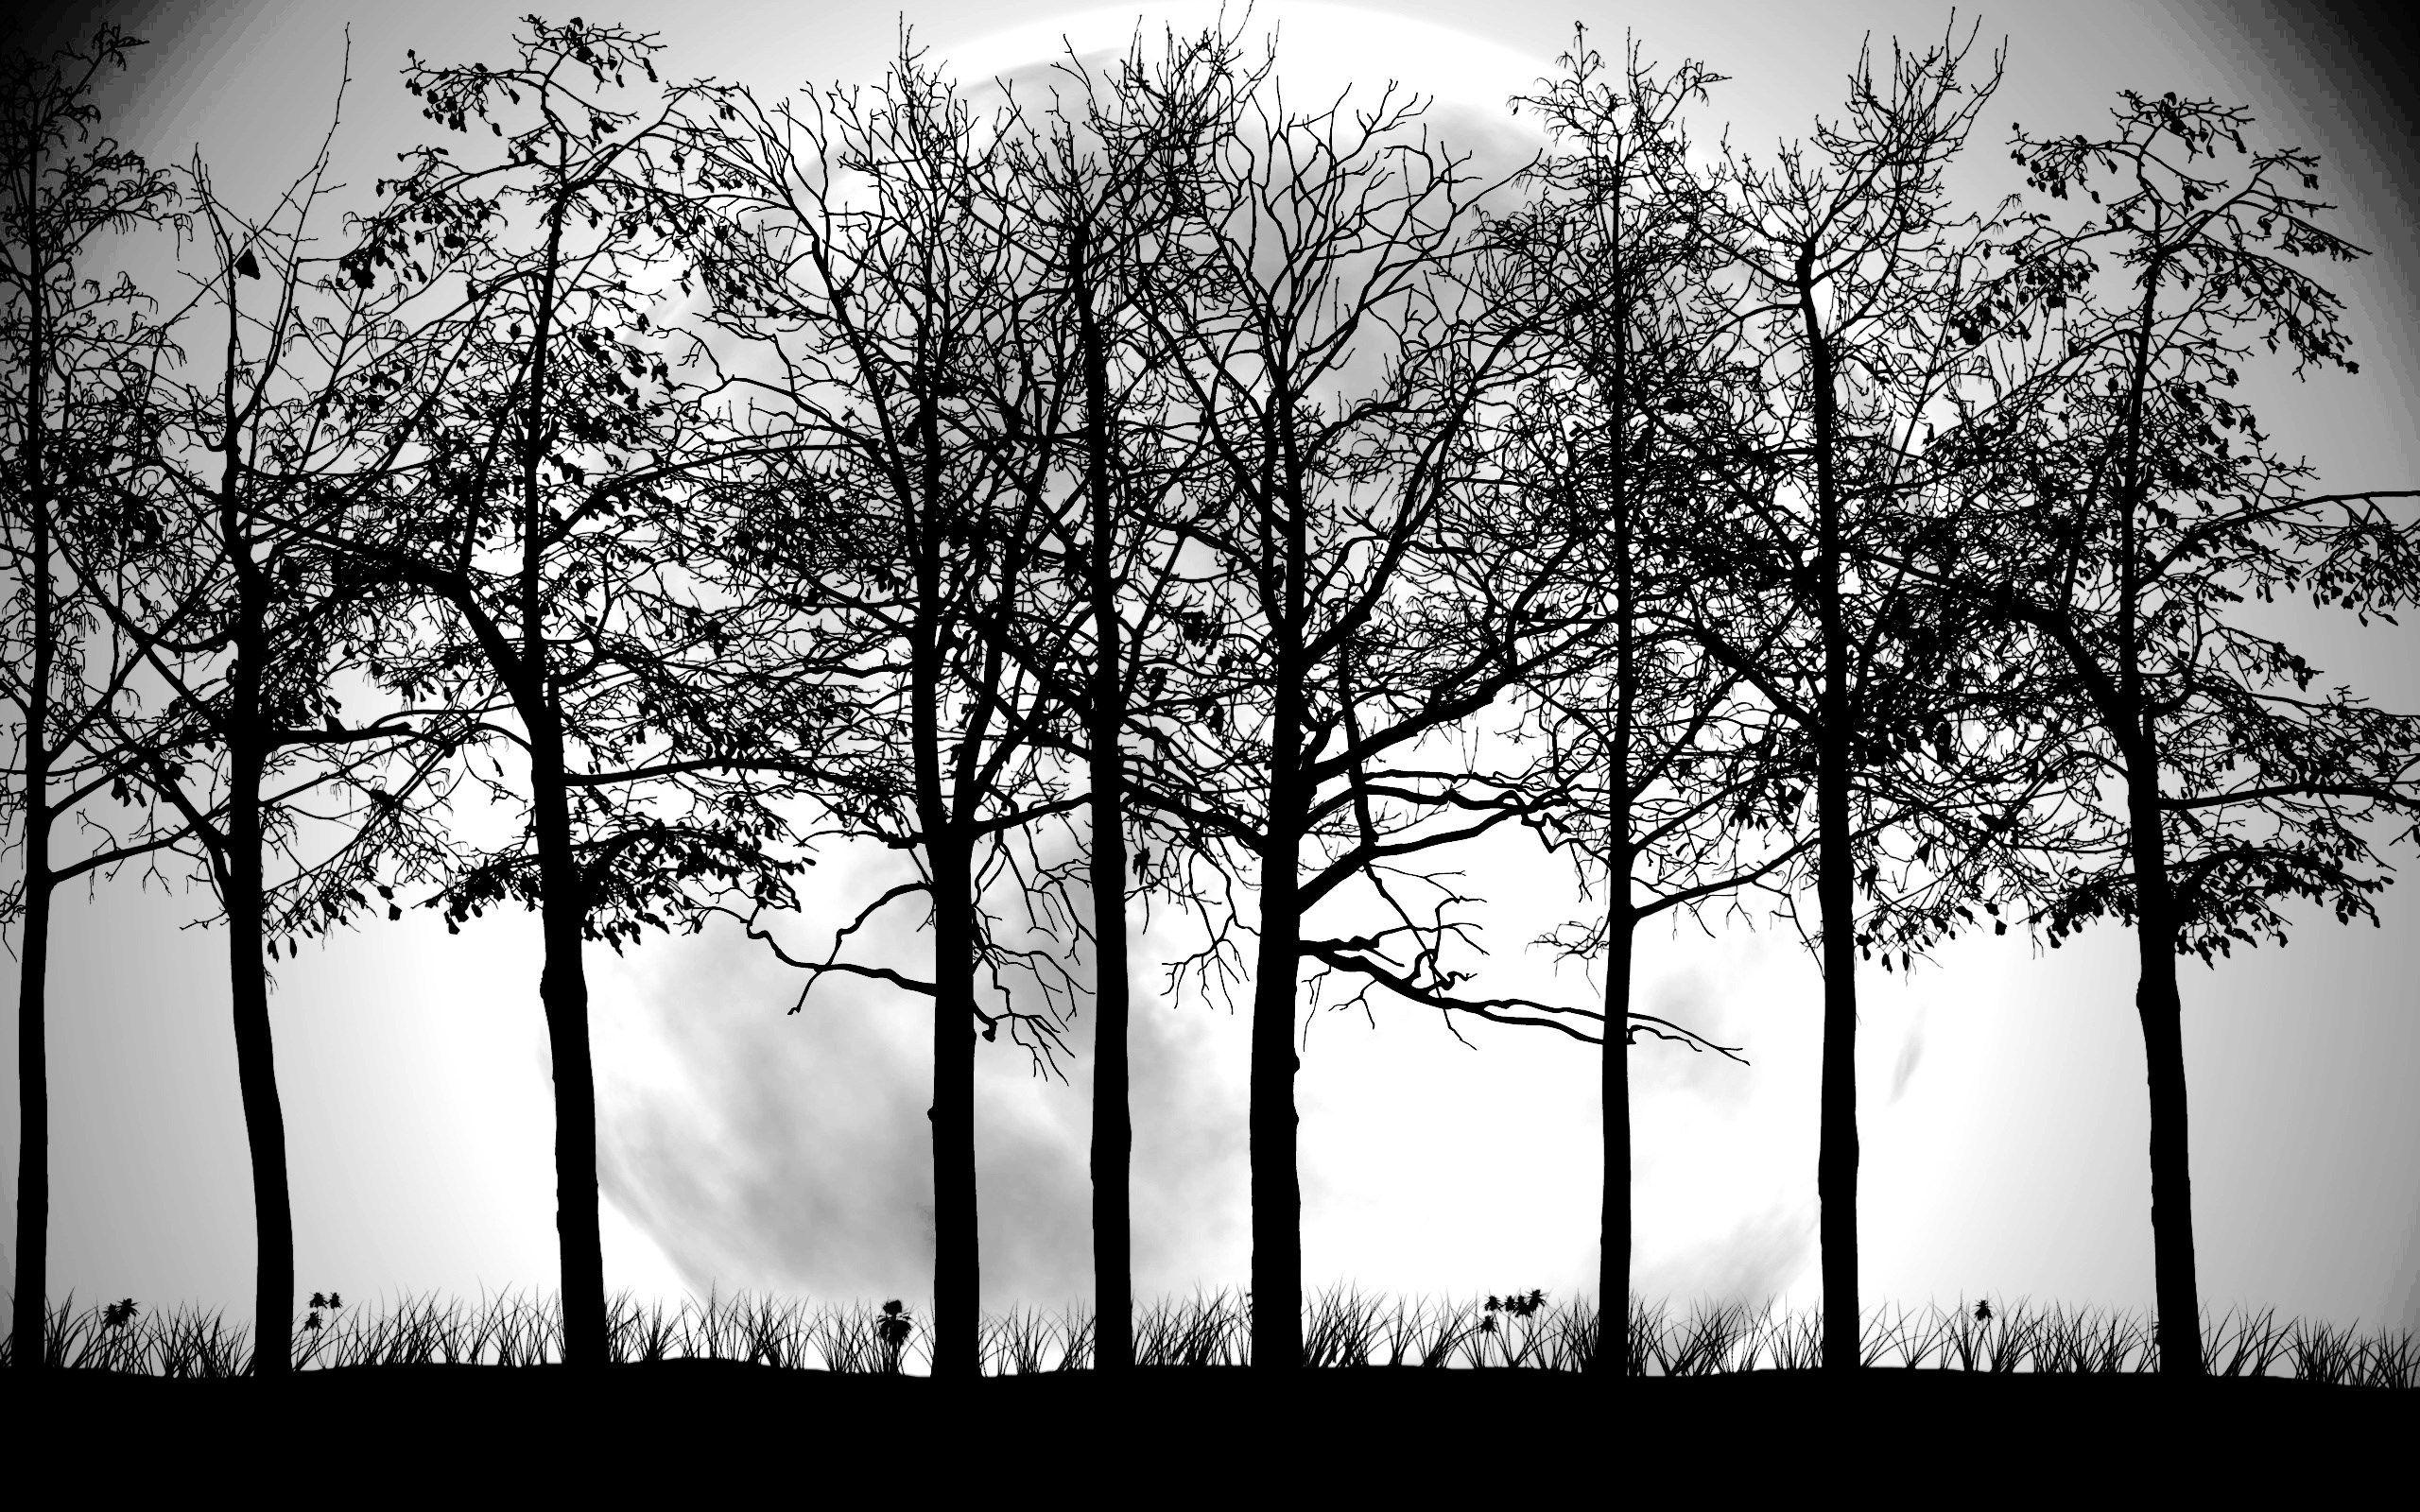 Tree Black And White Wallpaper Hd Ks6 Tree Silhouette Wallpaper Black And White Tree Tree Wallpaper Black And White